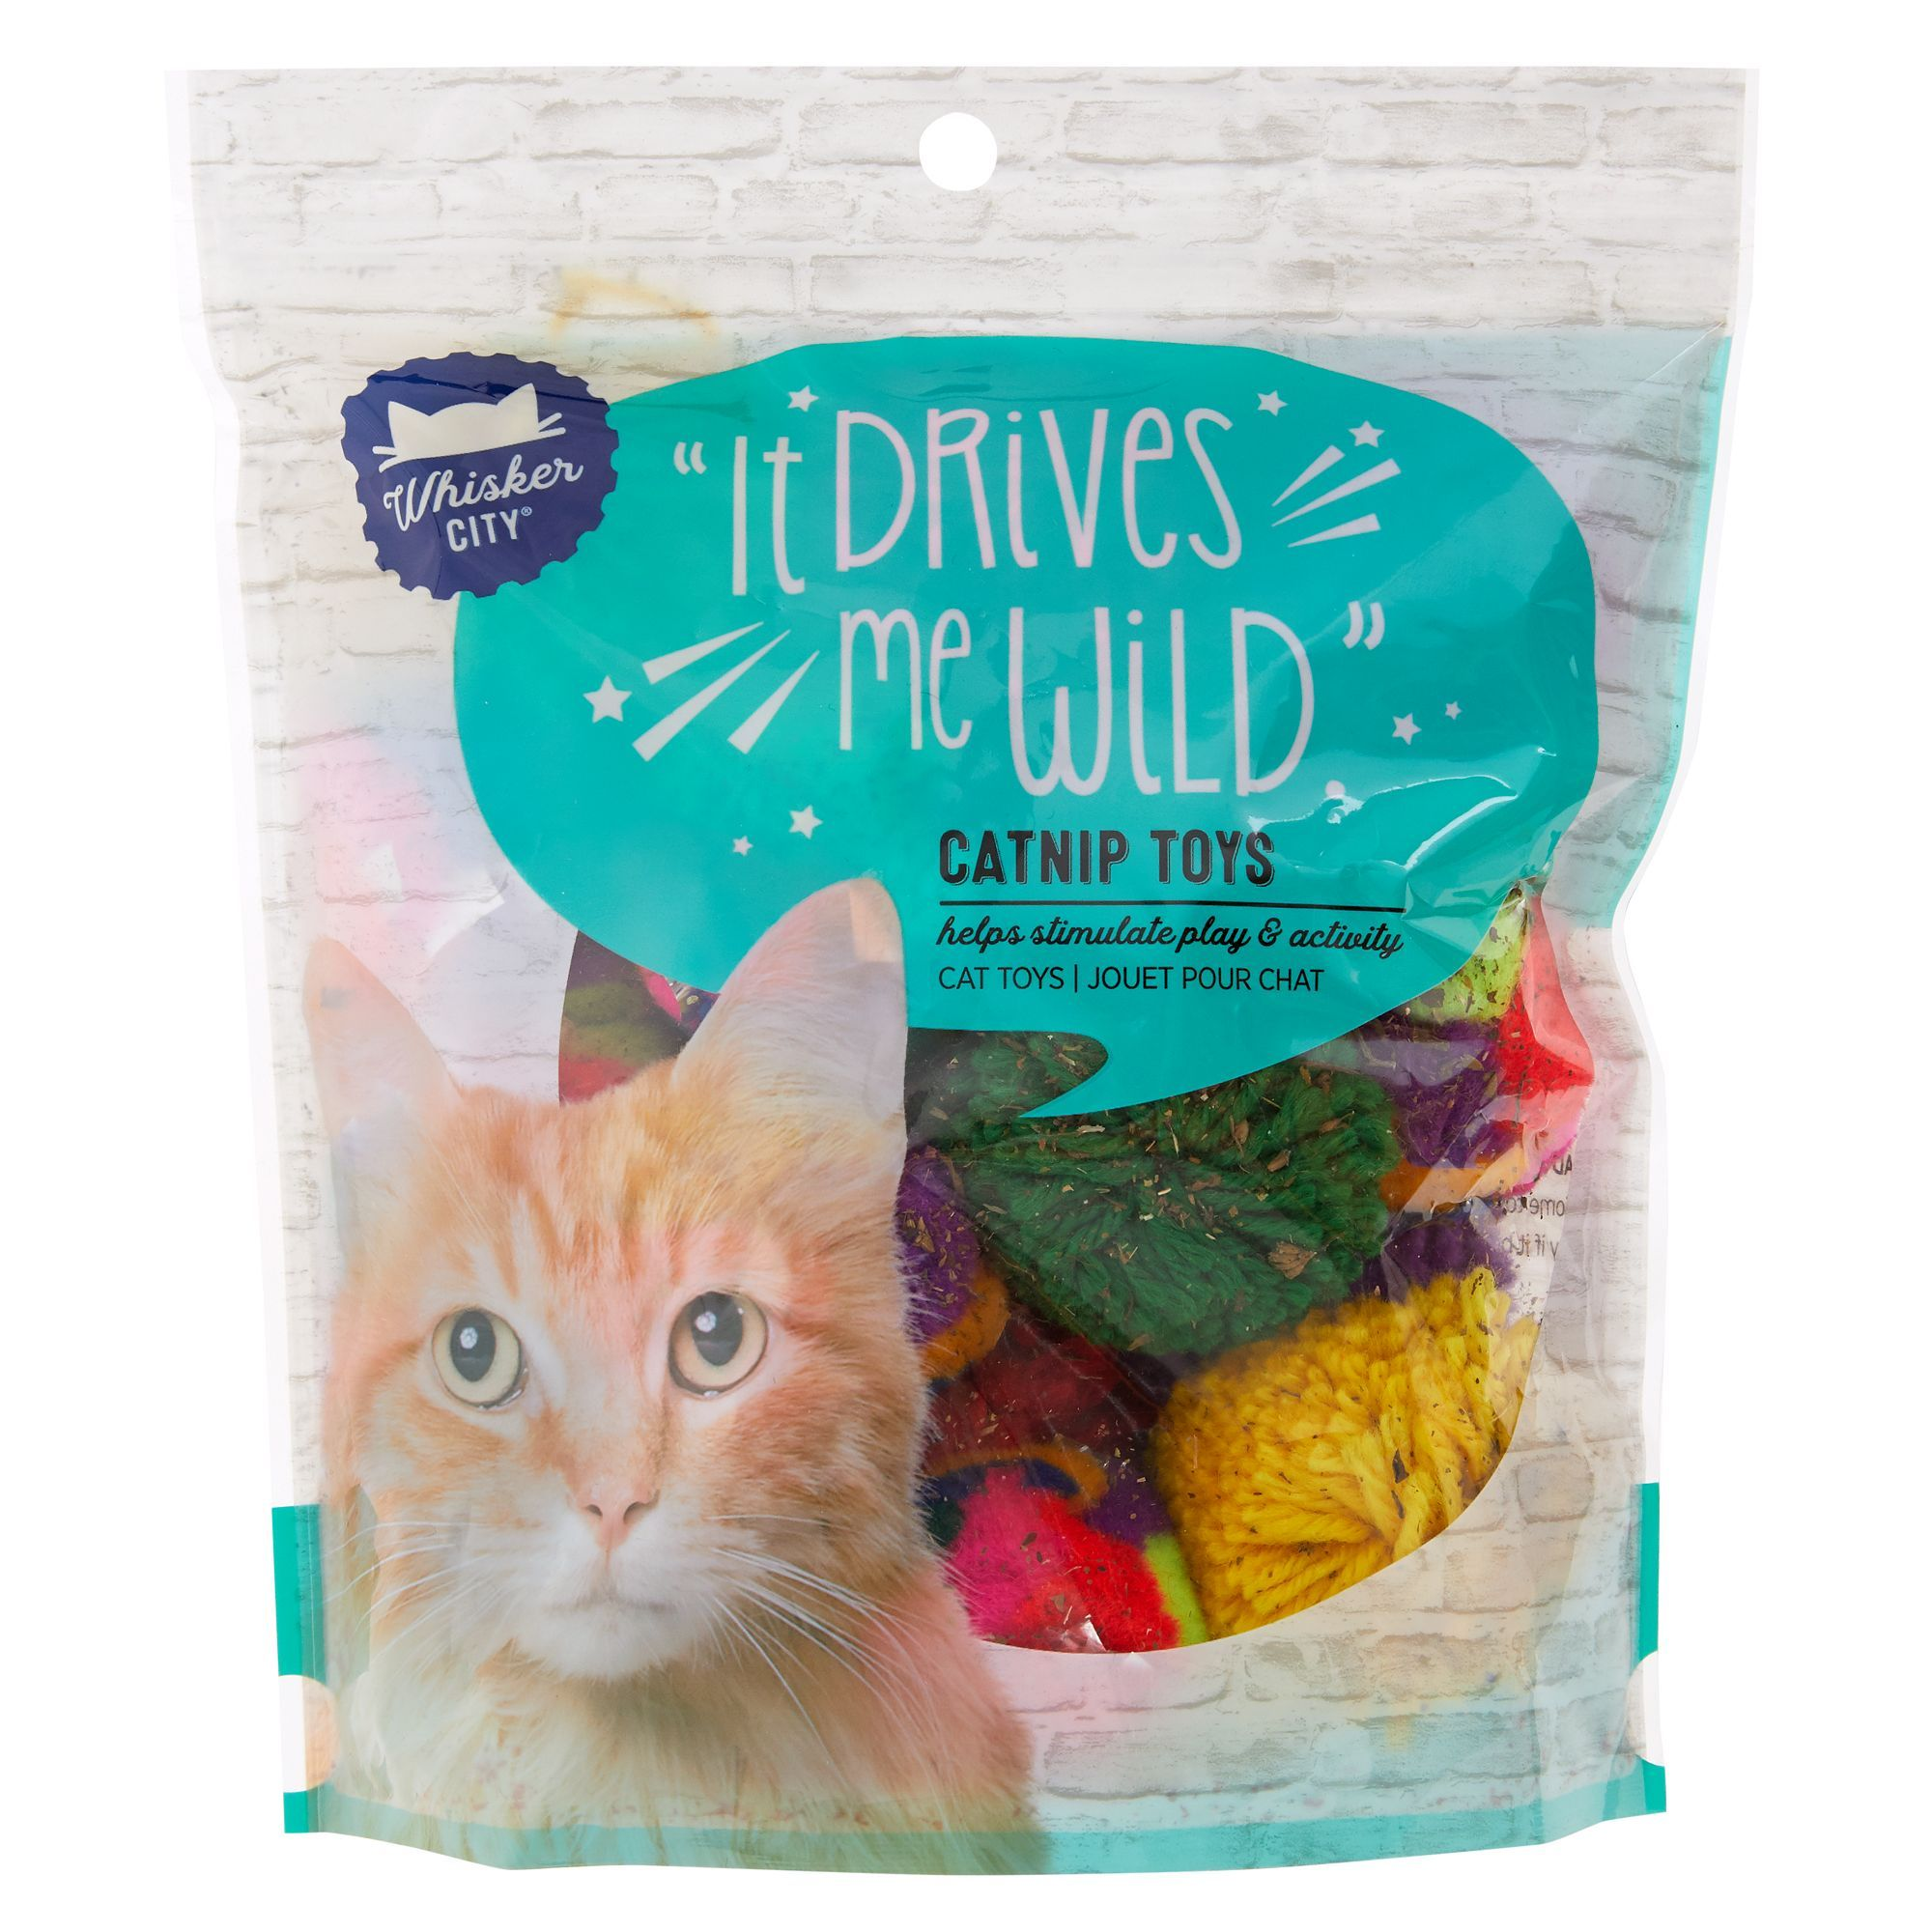 Whisker City Catnip Puff Cat Toys Cat Toys Cats Catnip Toys